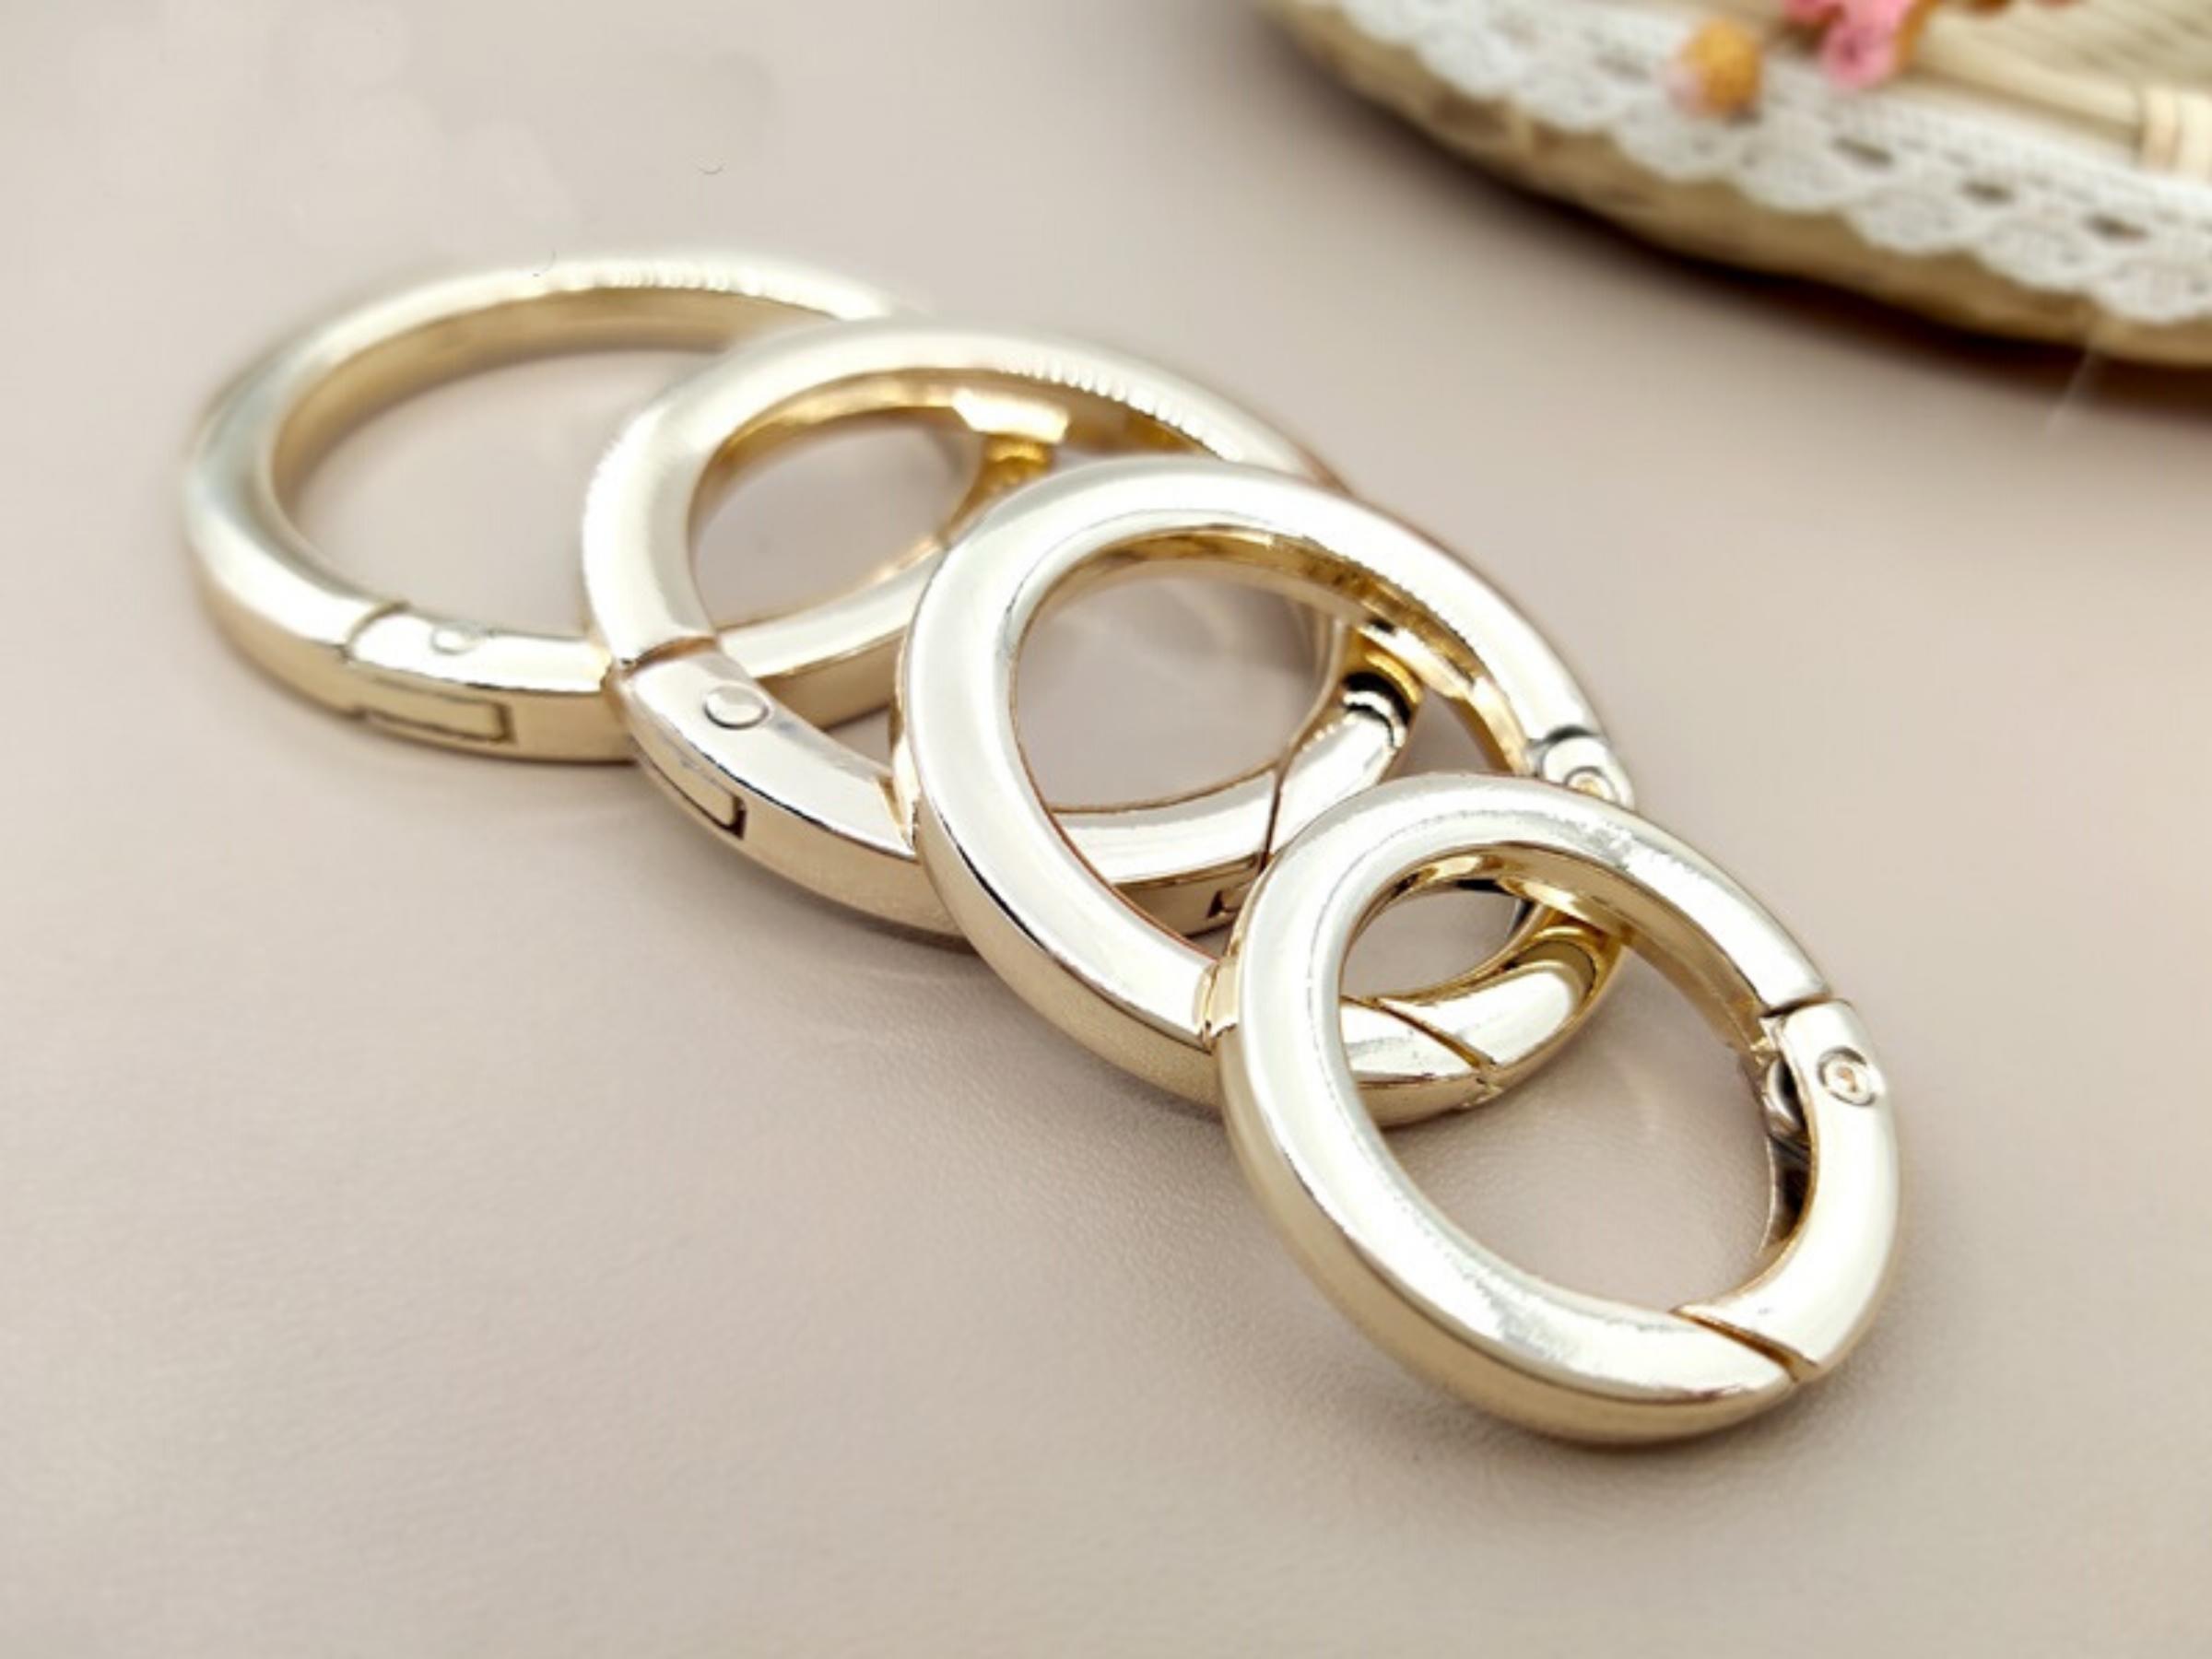 seremban Arts Crafts Sewing-o ring bag-bebagmaker (1).png